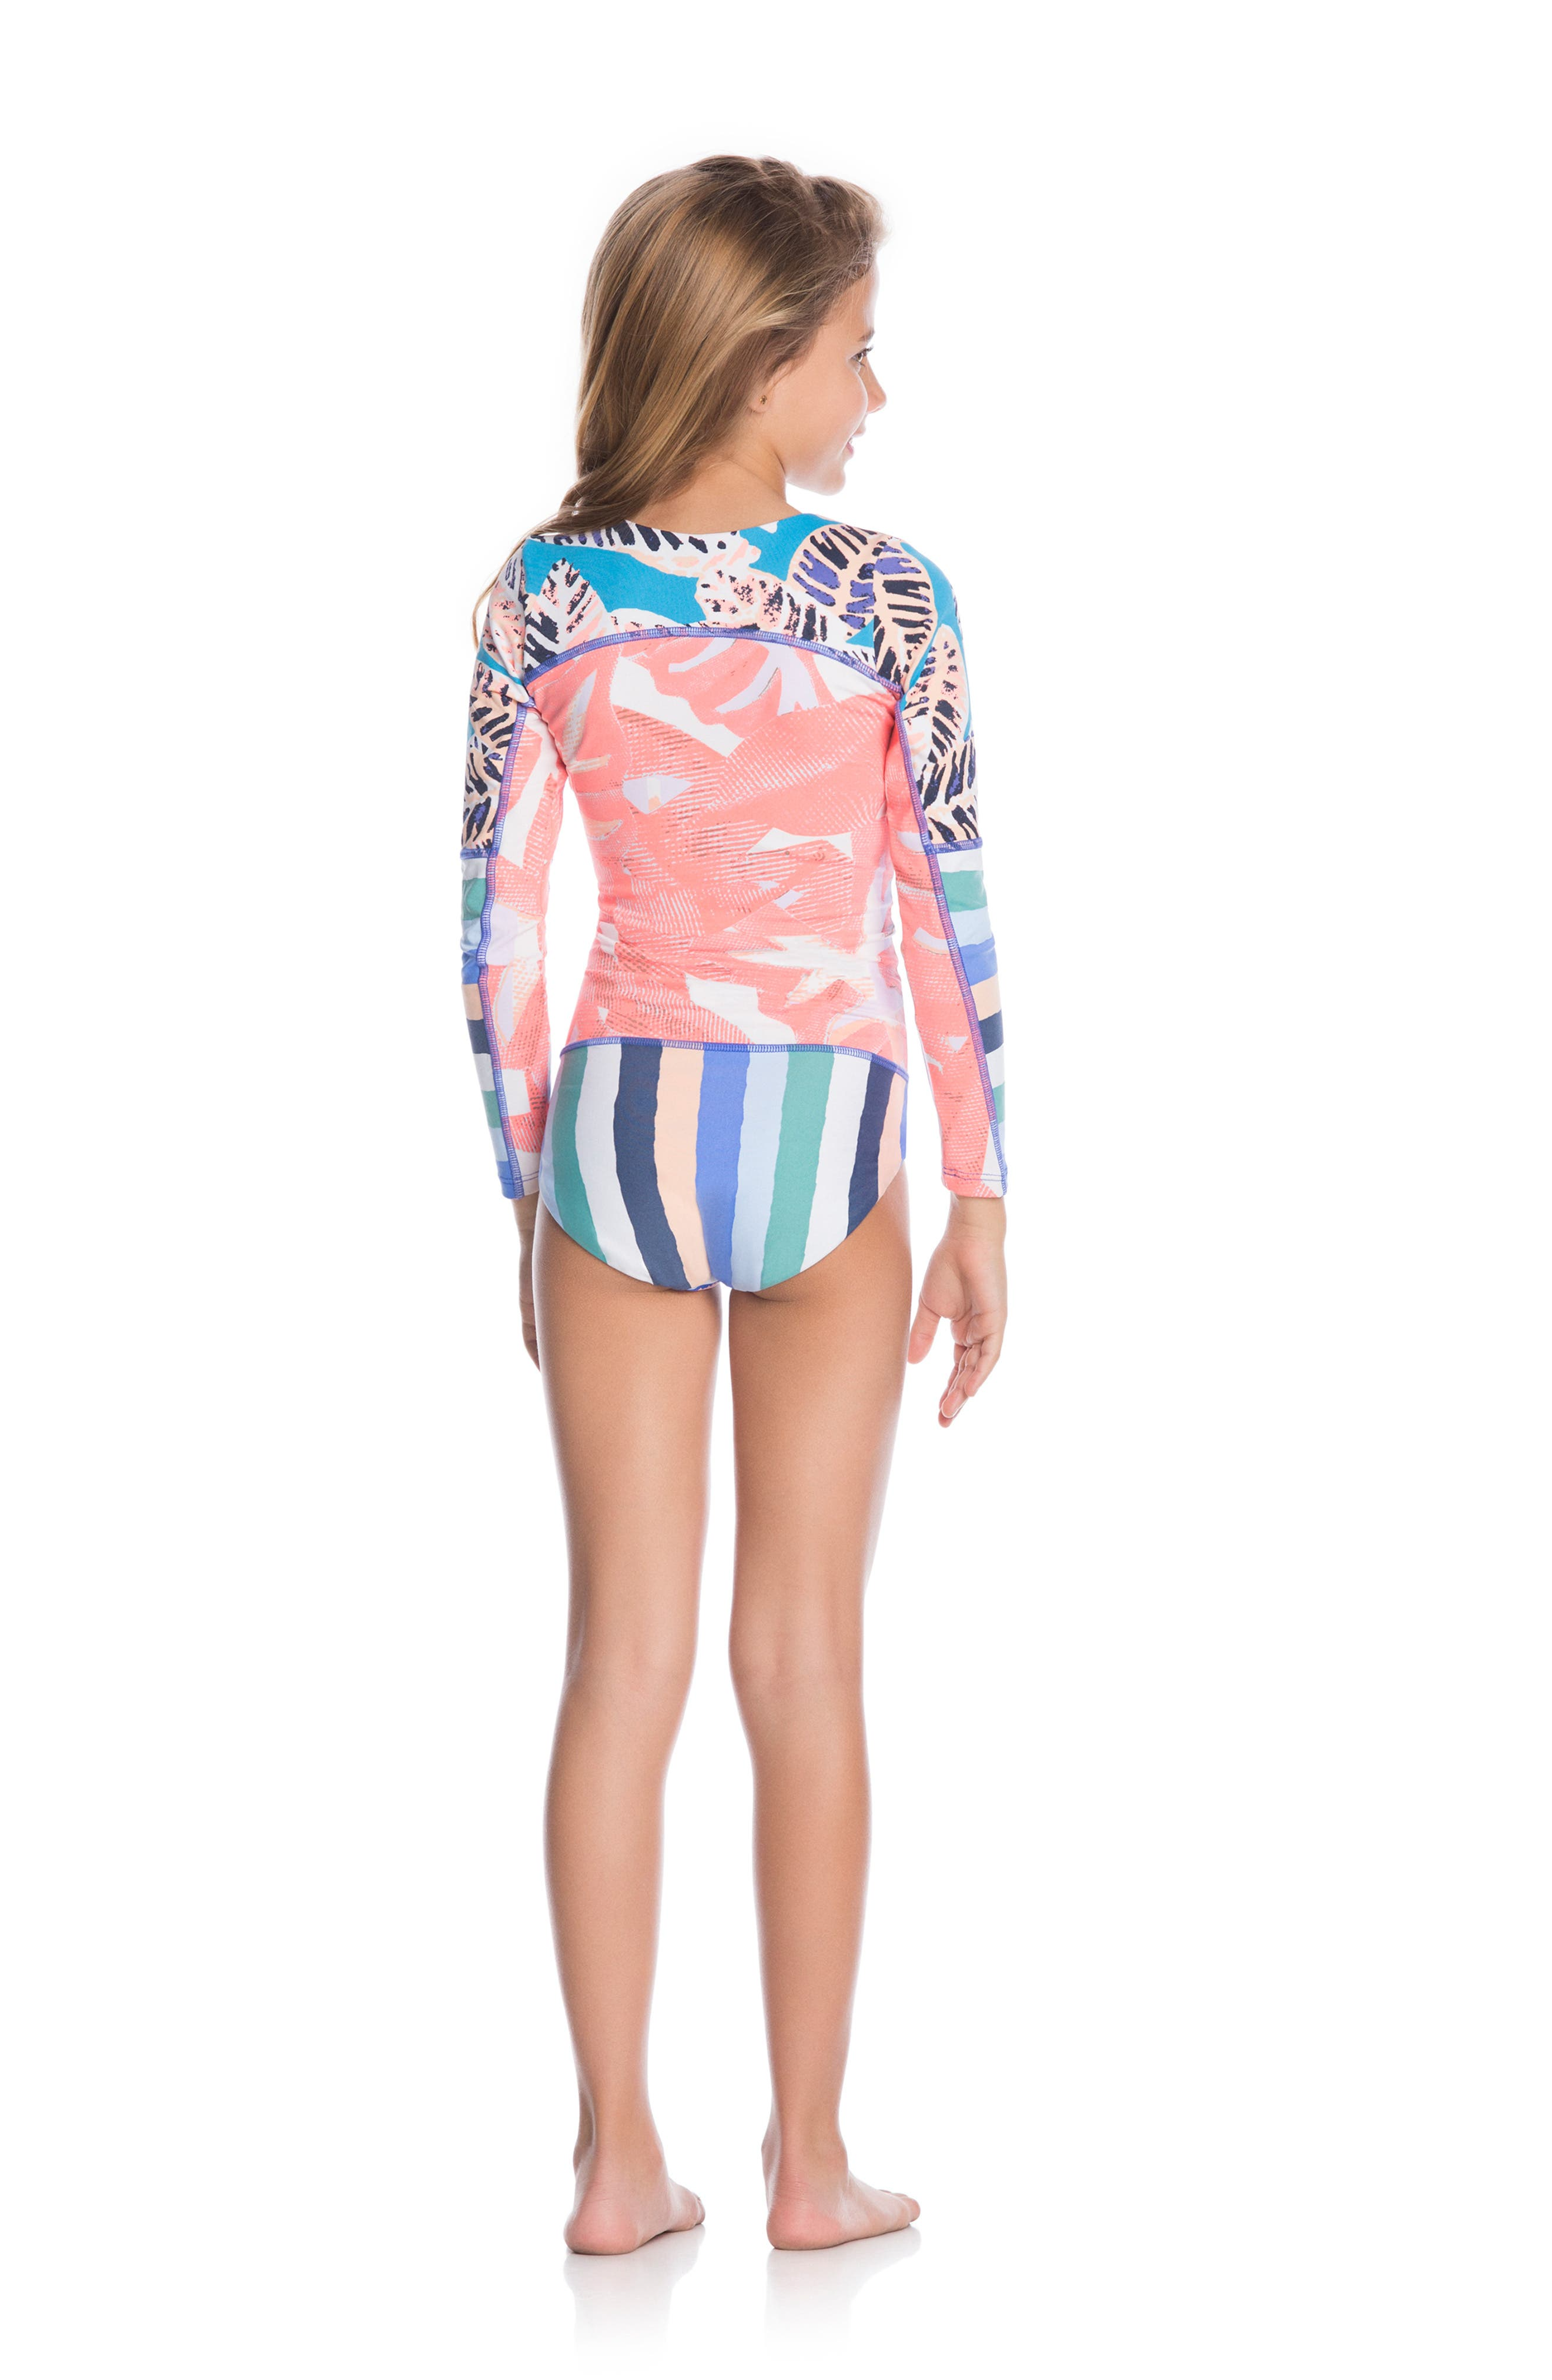 Ocean Joiness Reversible One-Piece Rashguard Swimsuit,                             Alternate thumbnail 4, color,                             MULTICOLOR